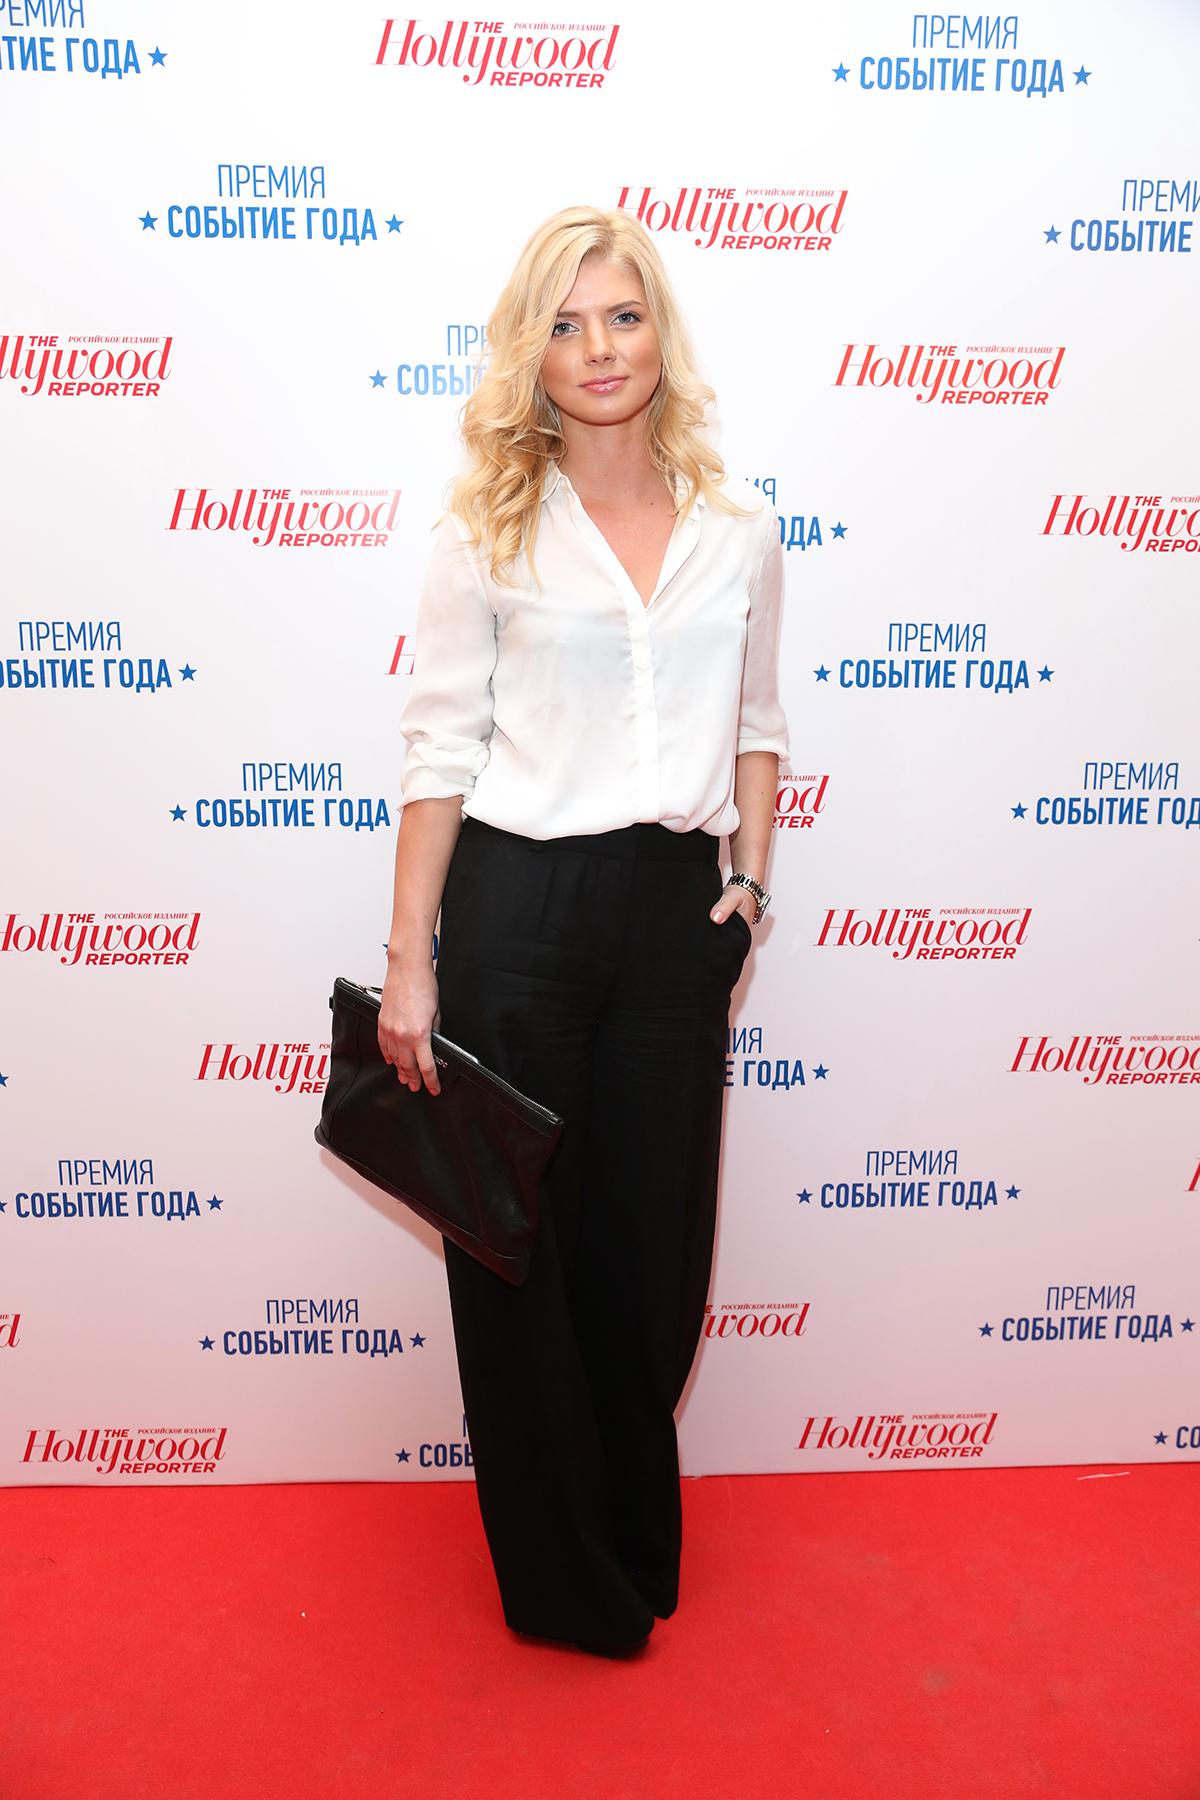 Актриса Анастасия Задорожная